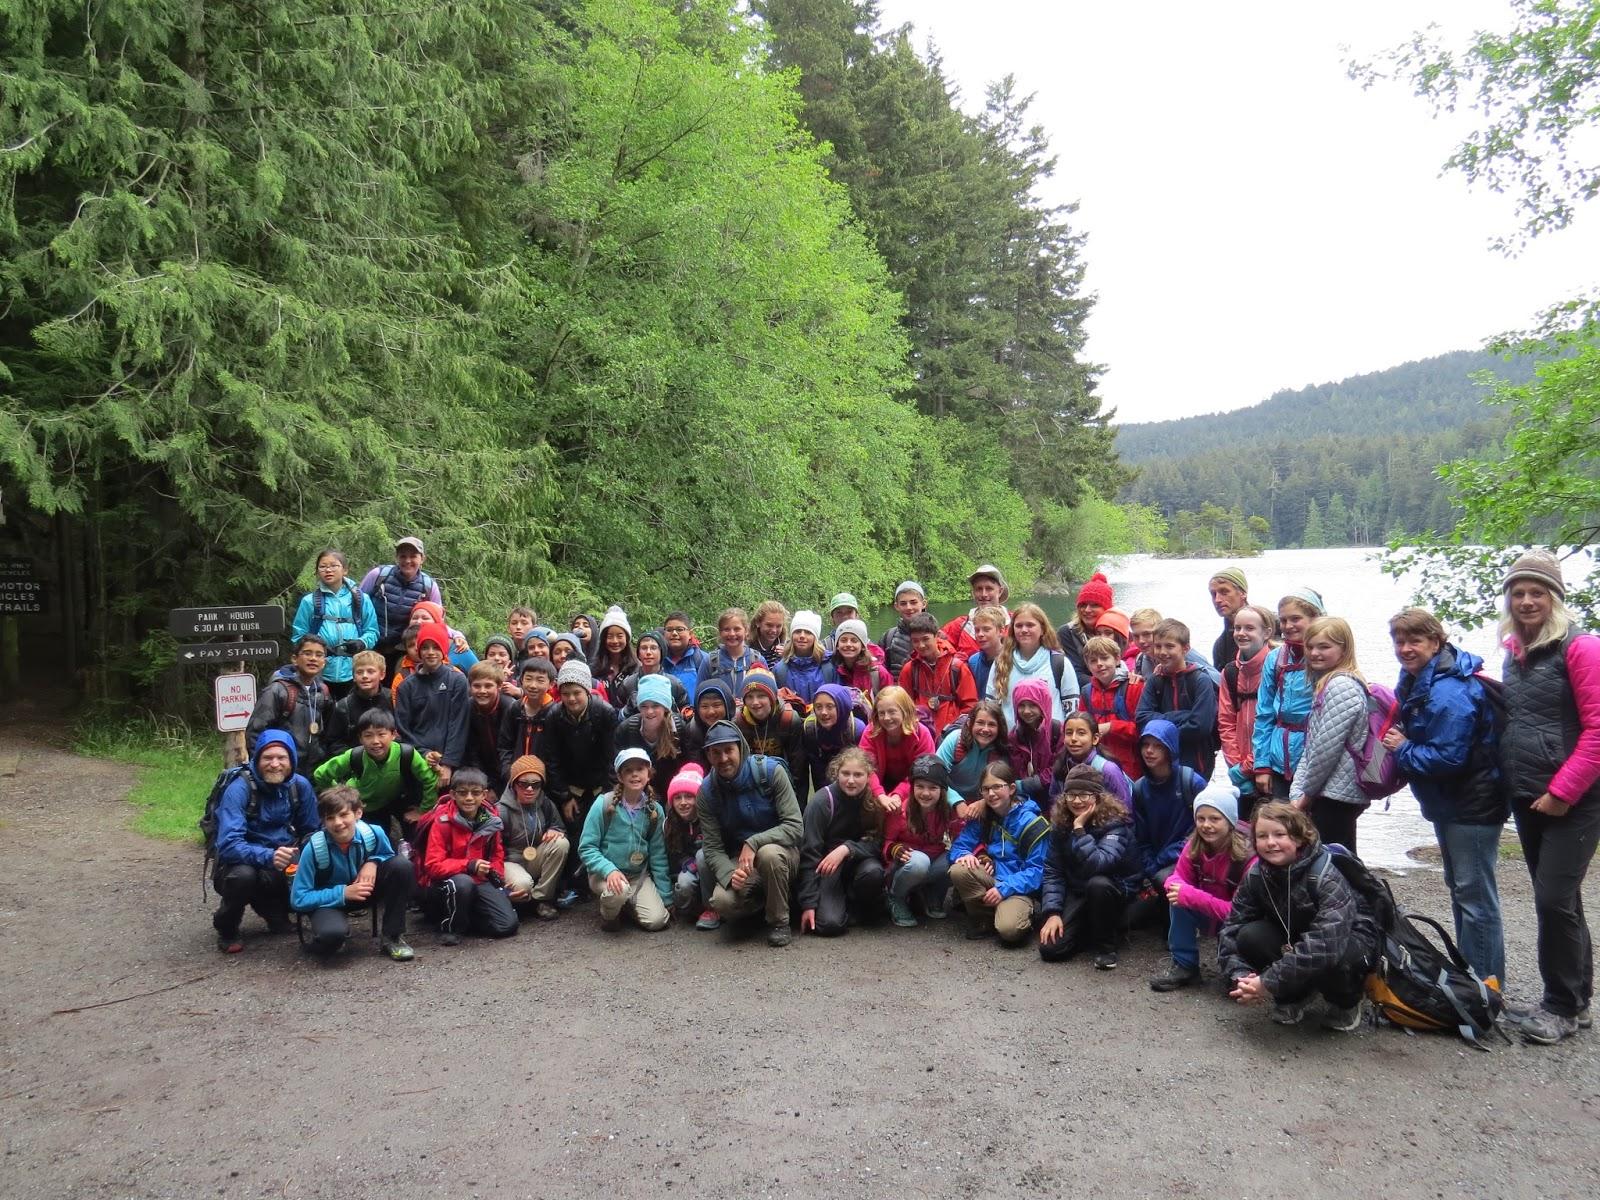 YMCA Camp Orkila: The Blog